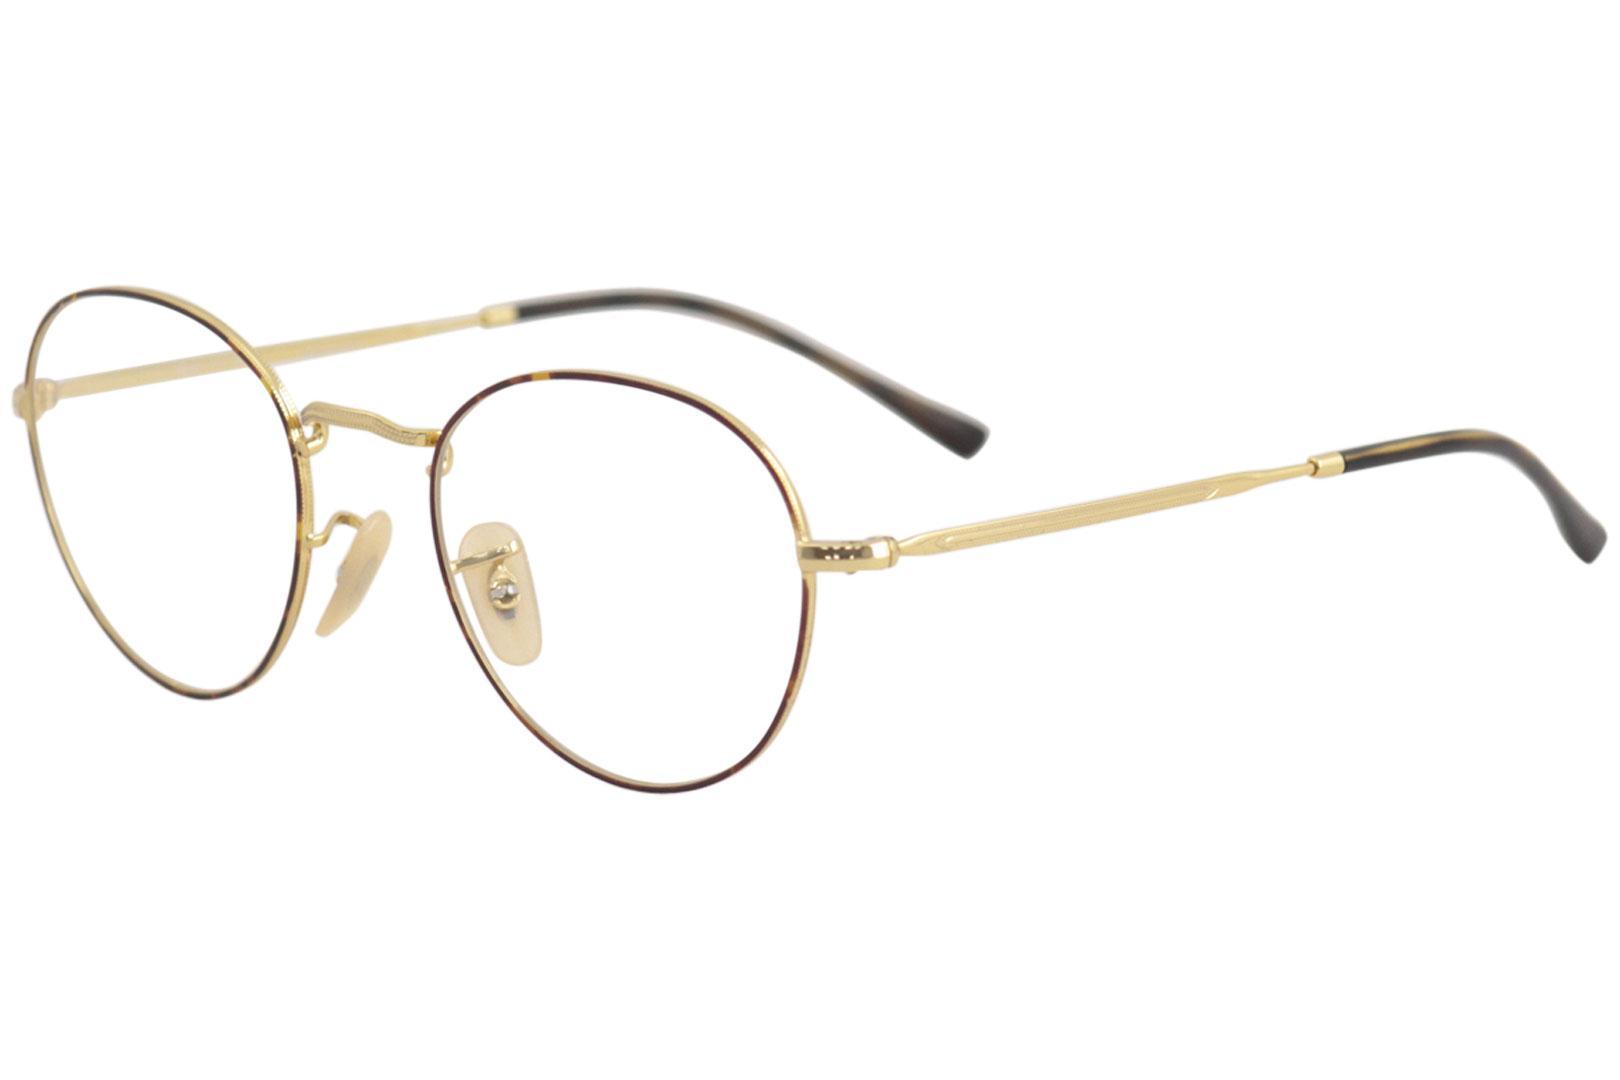 031343b5c1f Ray Ban Eyeglasses RB3582V RX 3582 V 2945 Havana Gold RayBan Optical ...